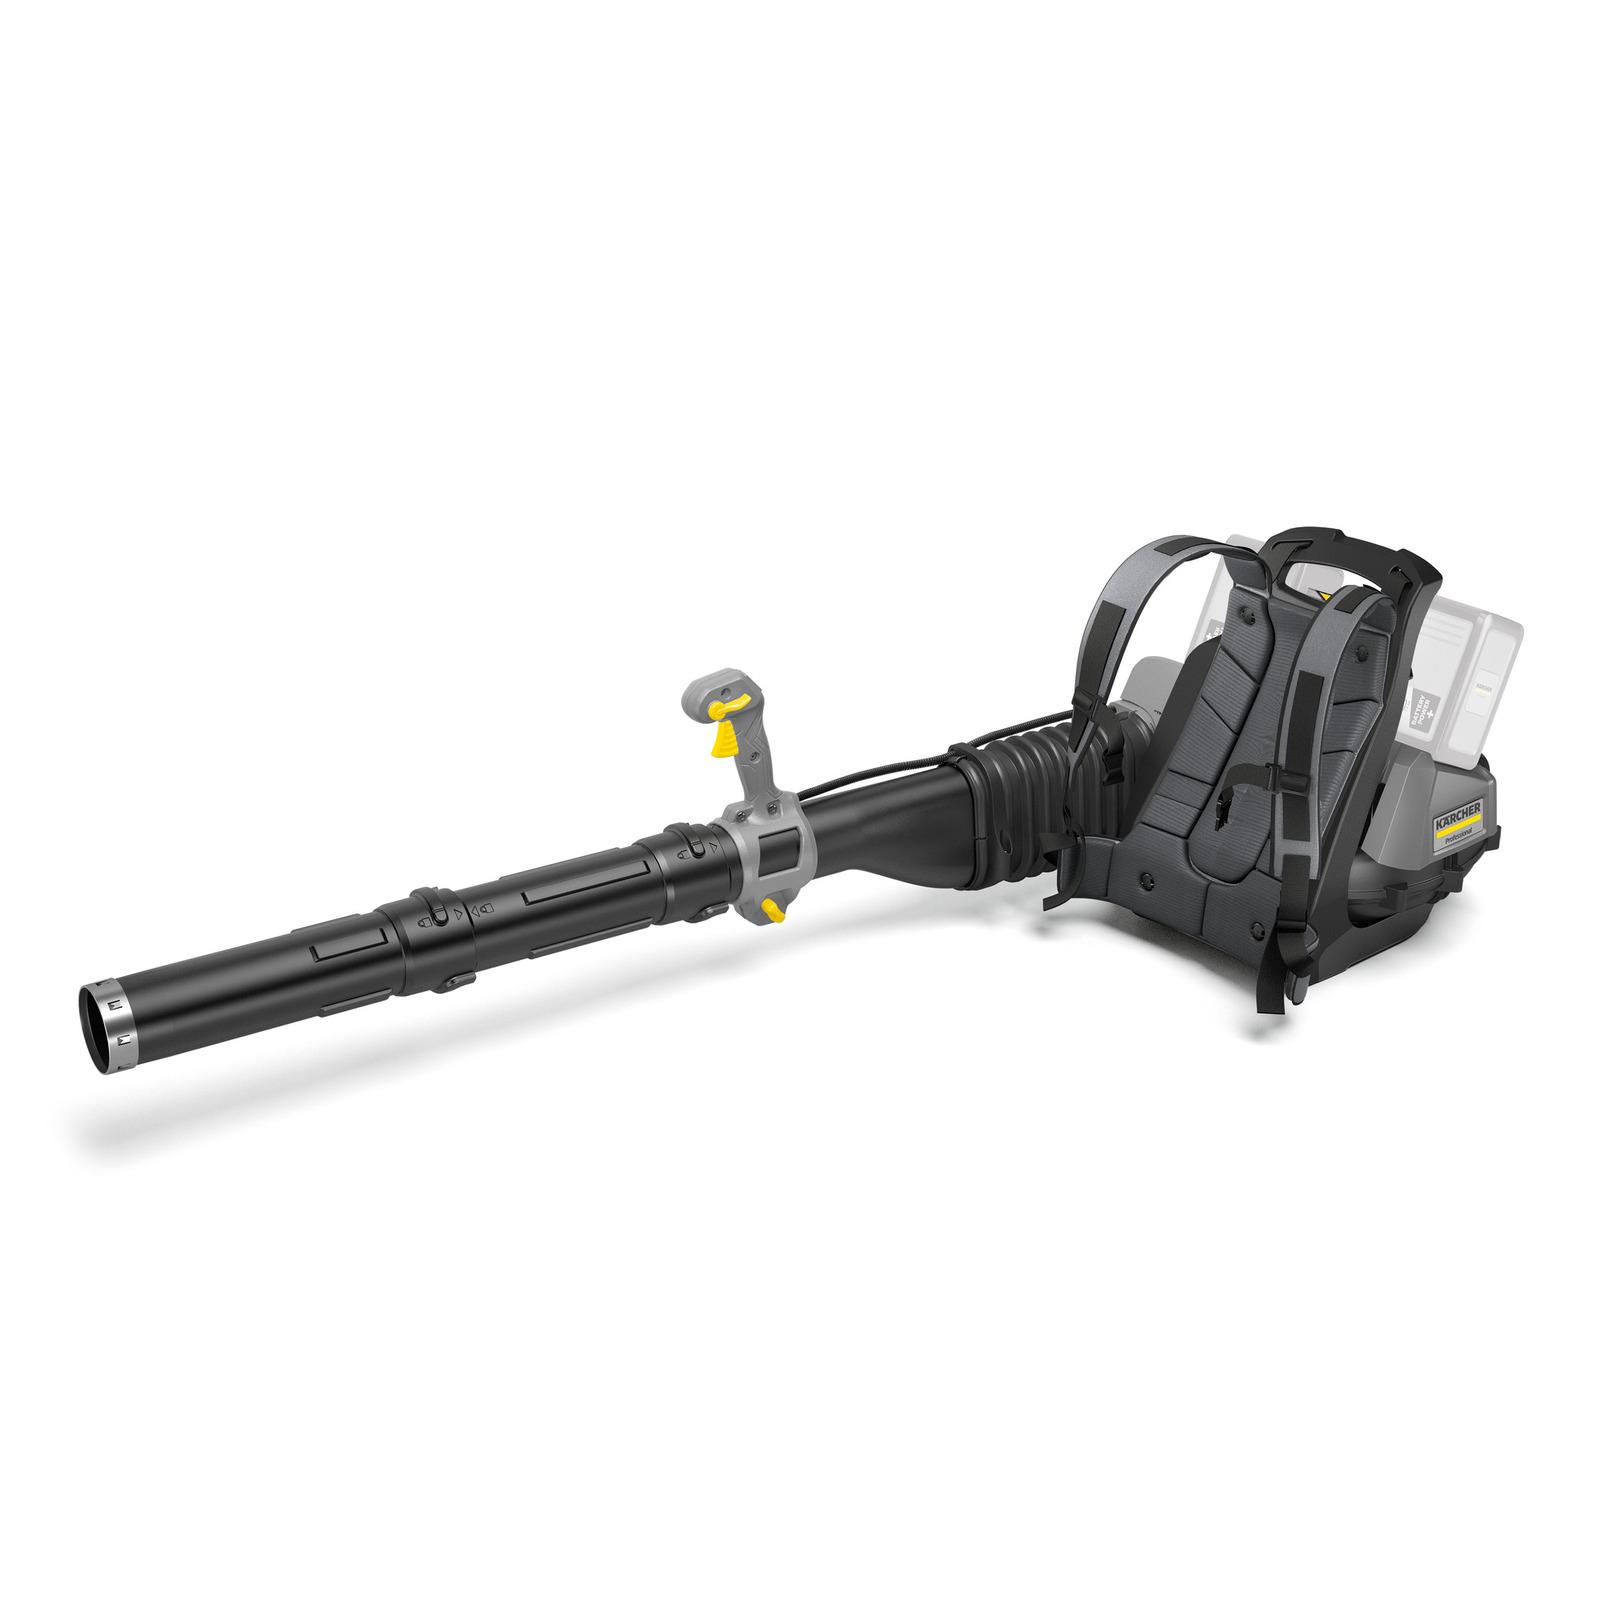 KARCHER 1.042-509.0 - LBB 1060/36 BP Leaf Blower